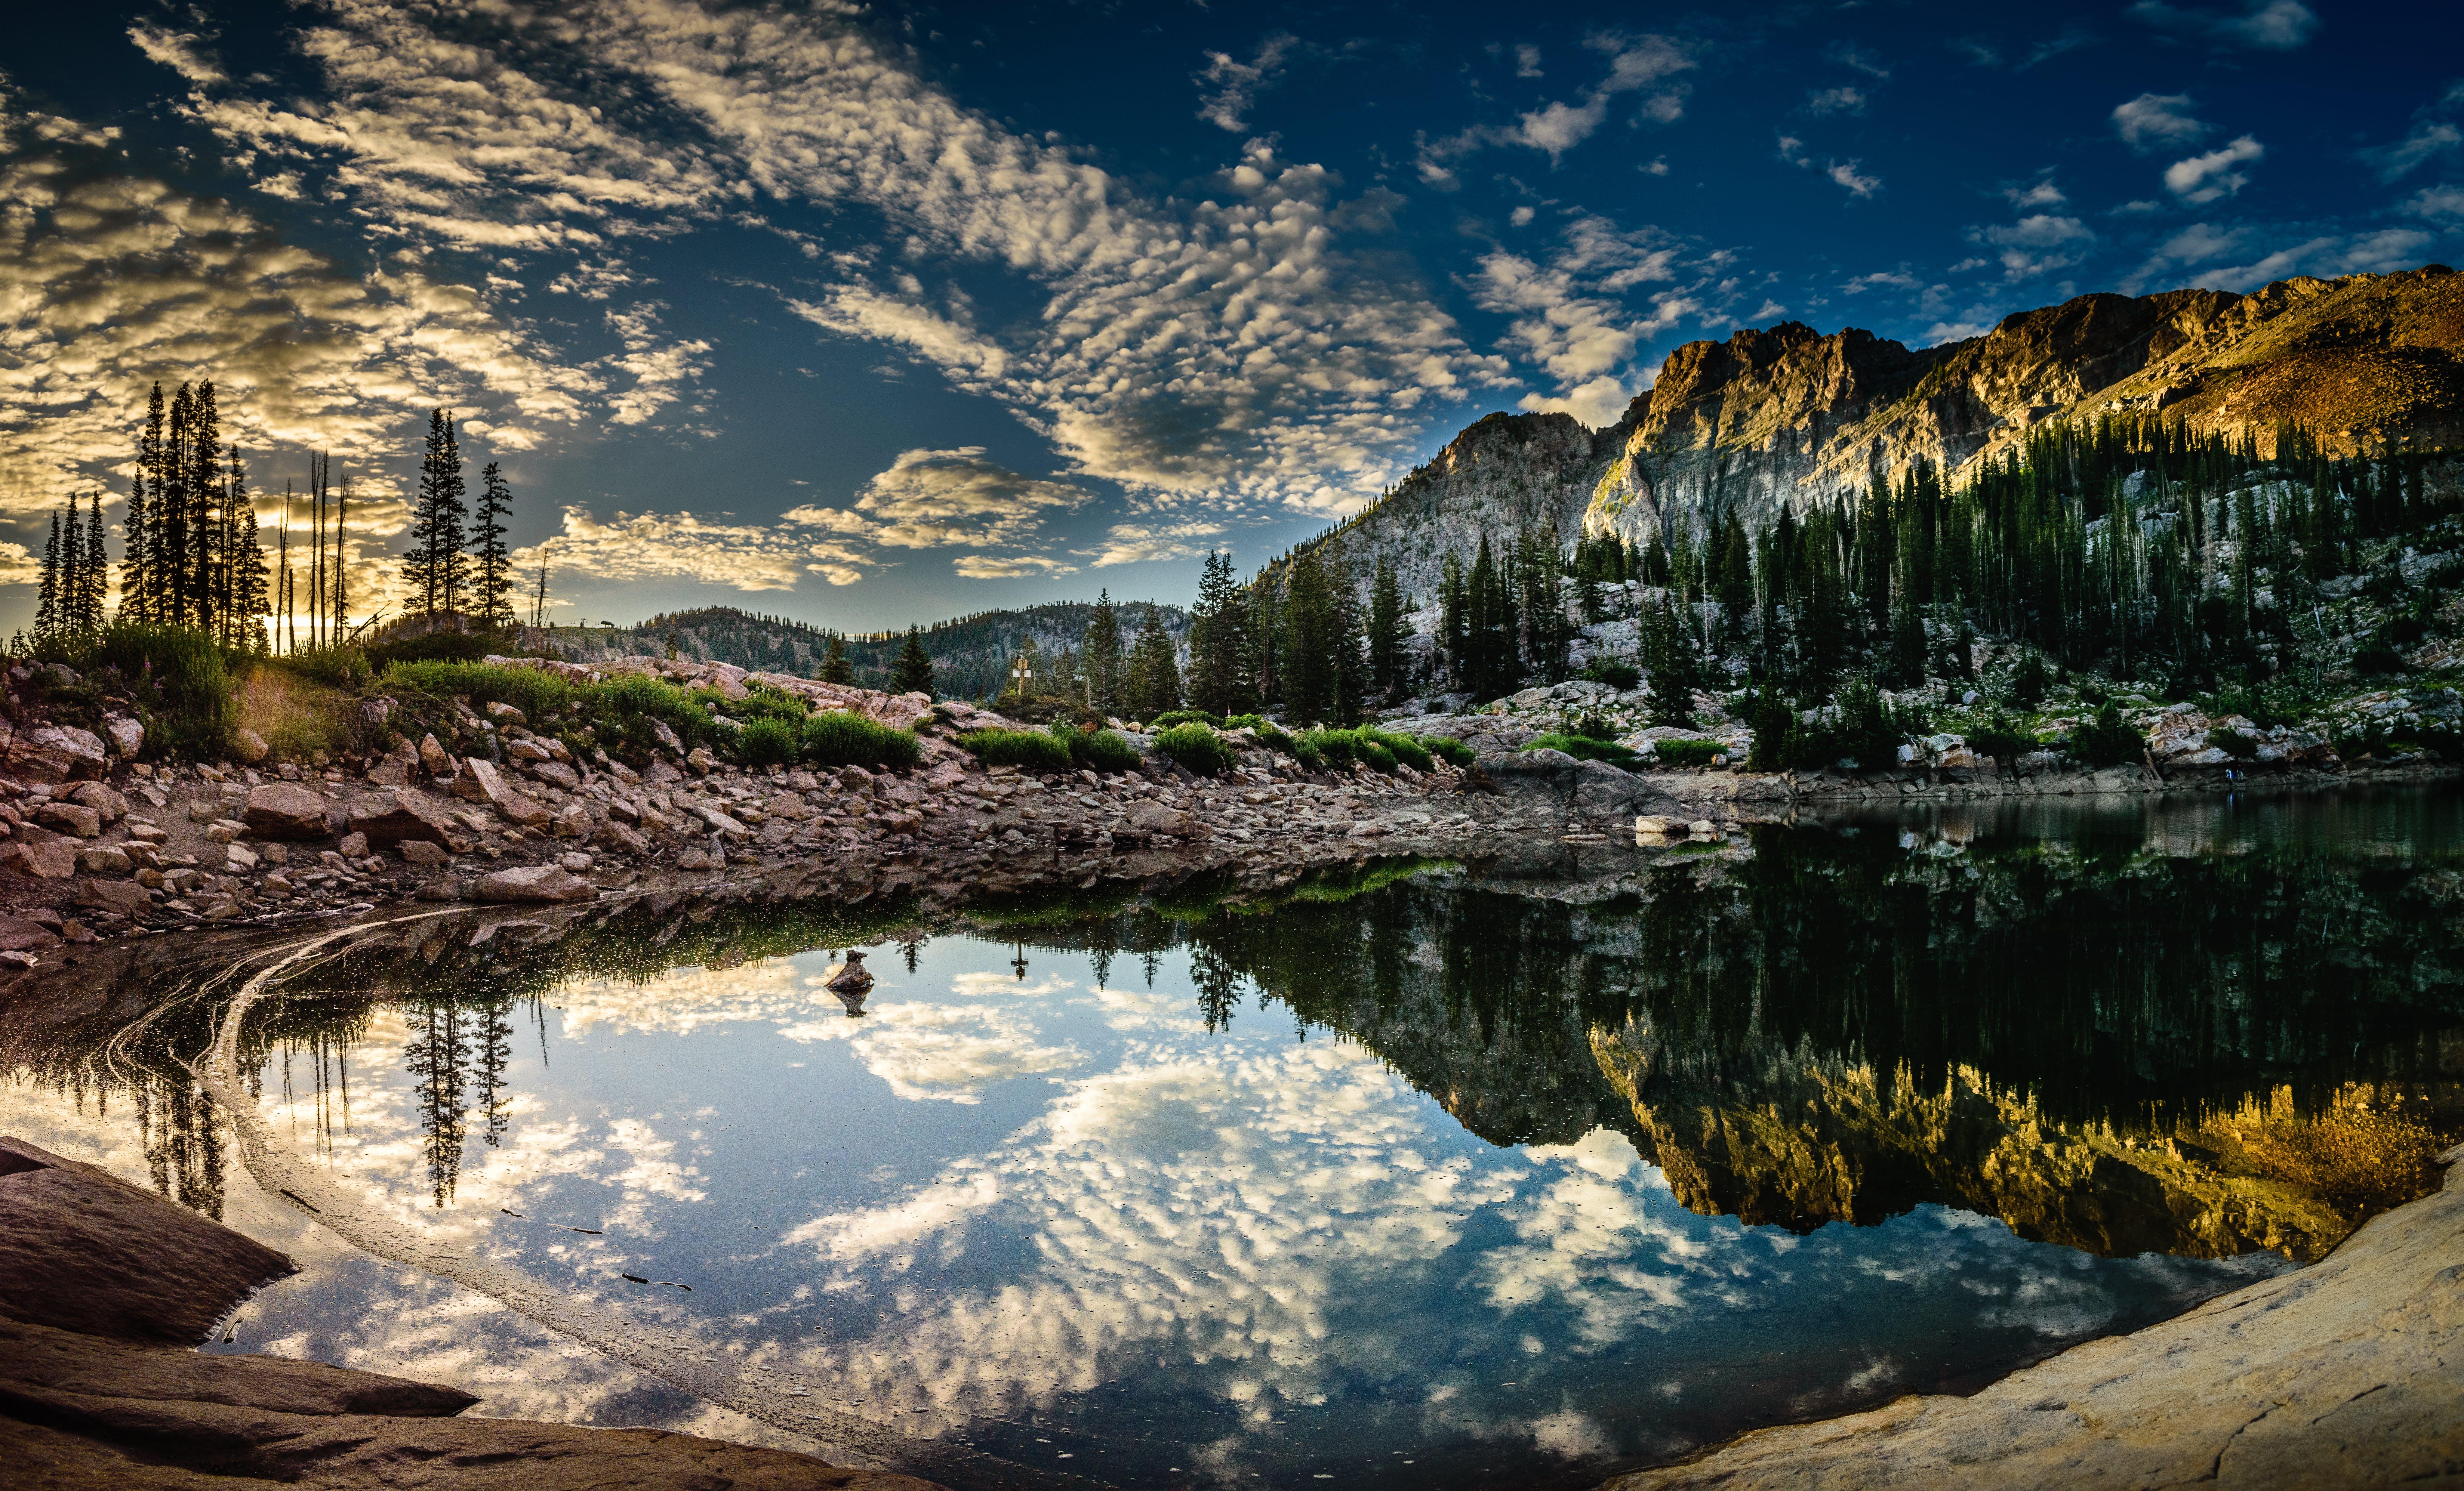 Kostnadsfri bild av berg, dagsljus, landskap, natur